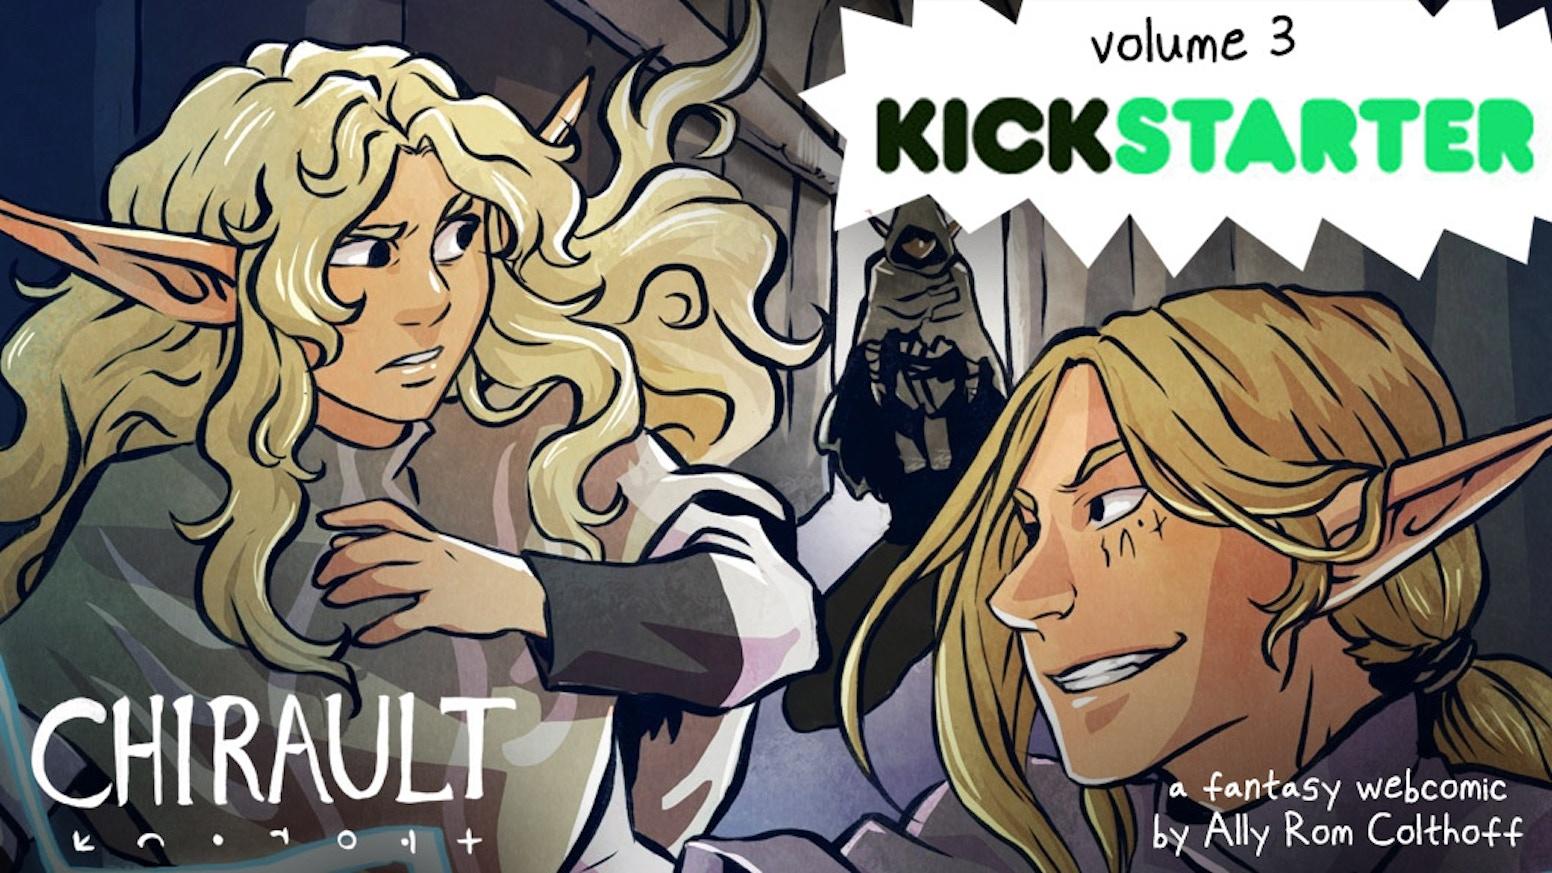 Printing Volume 3 of Chirault, an epic fantasy graphic novel!